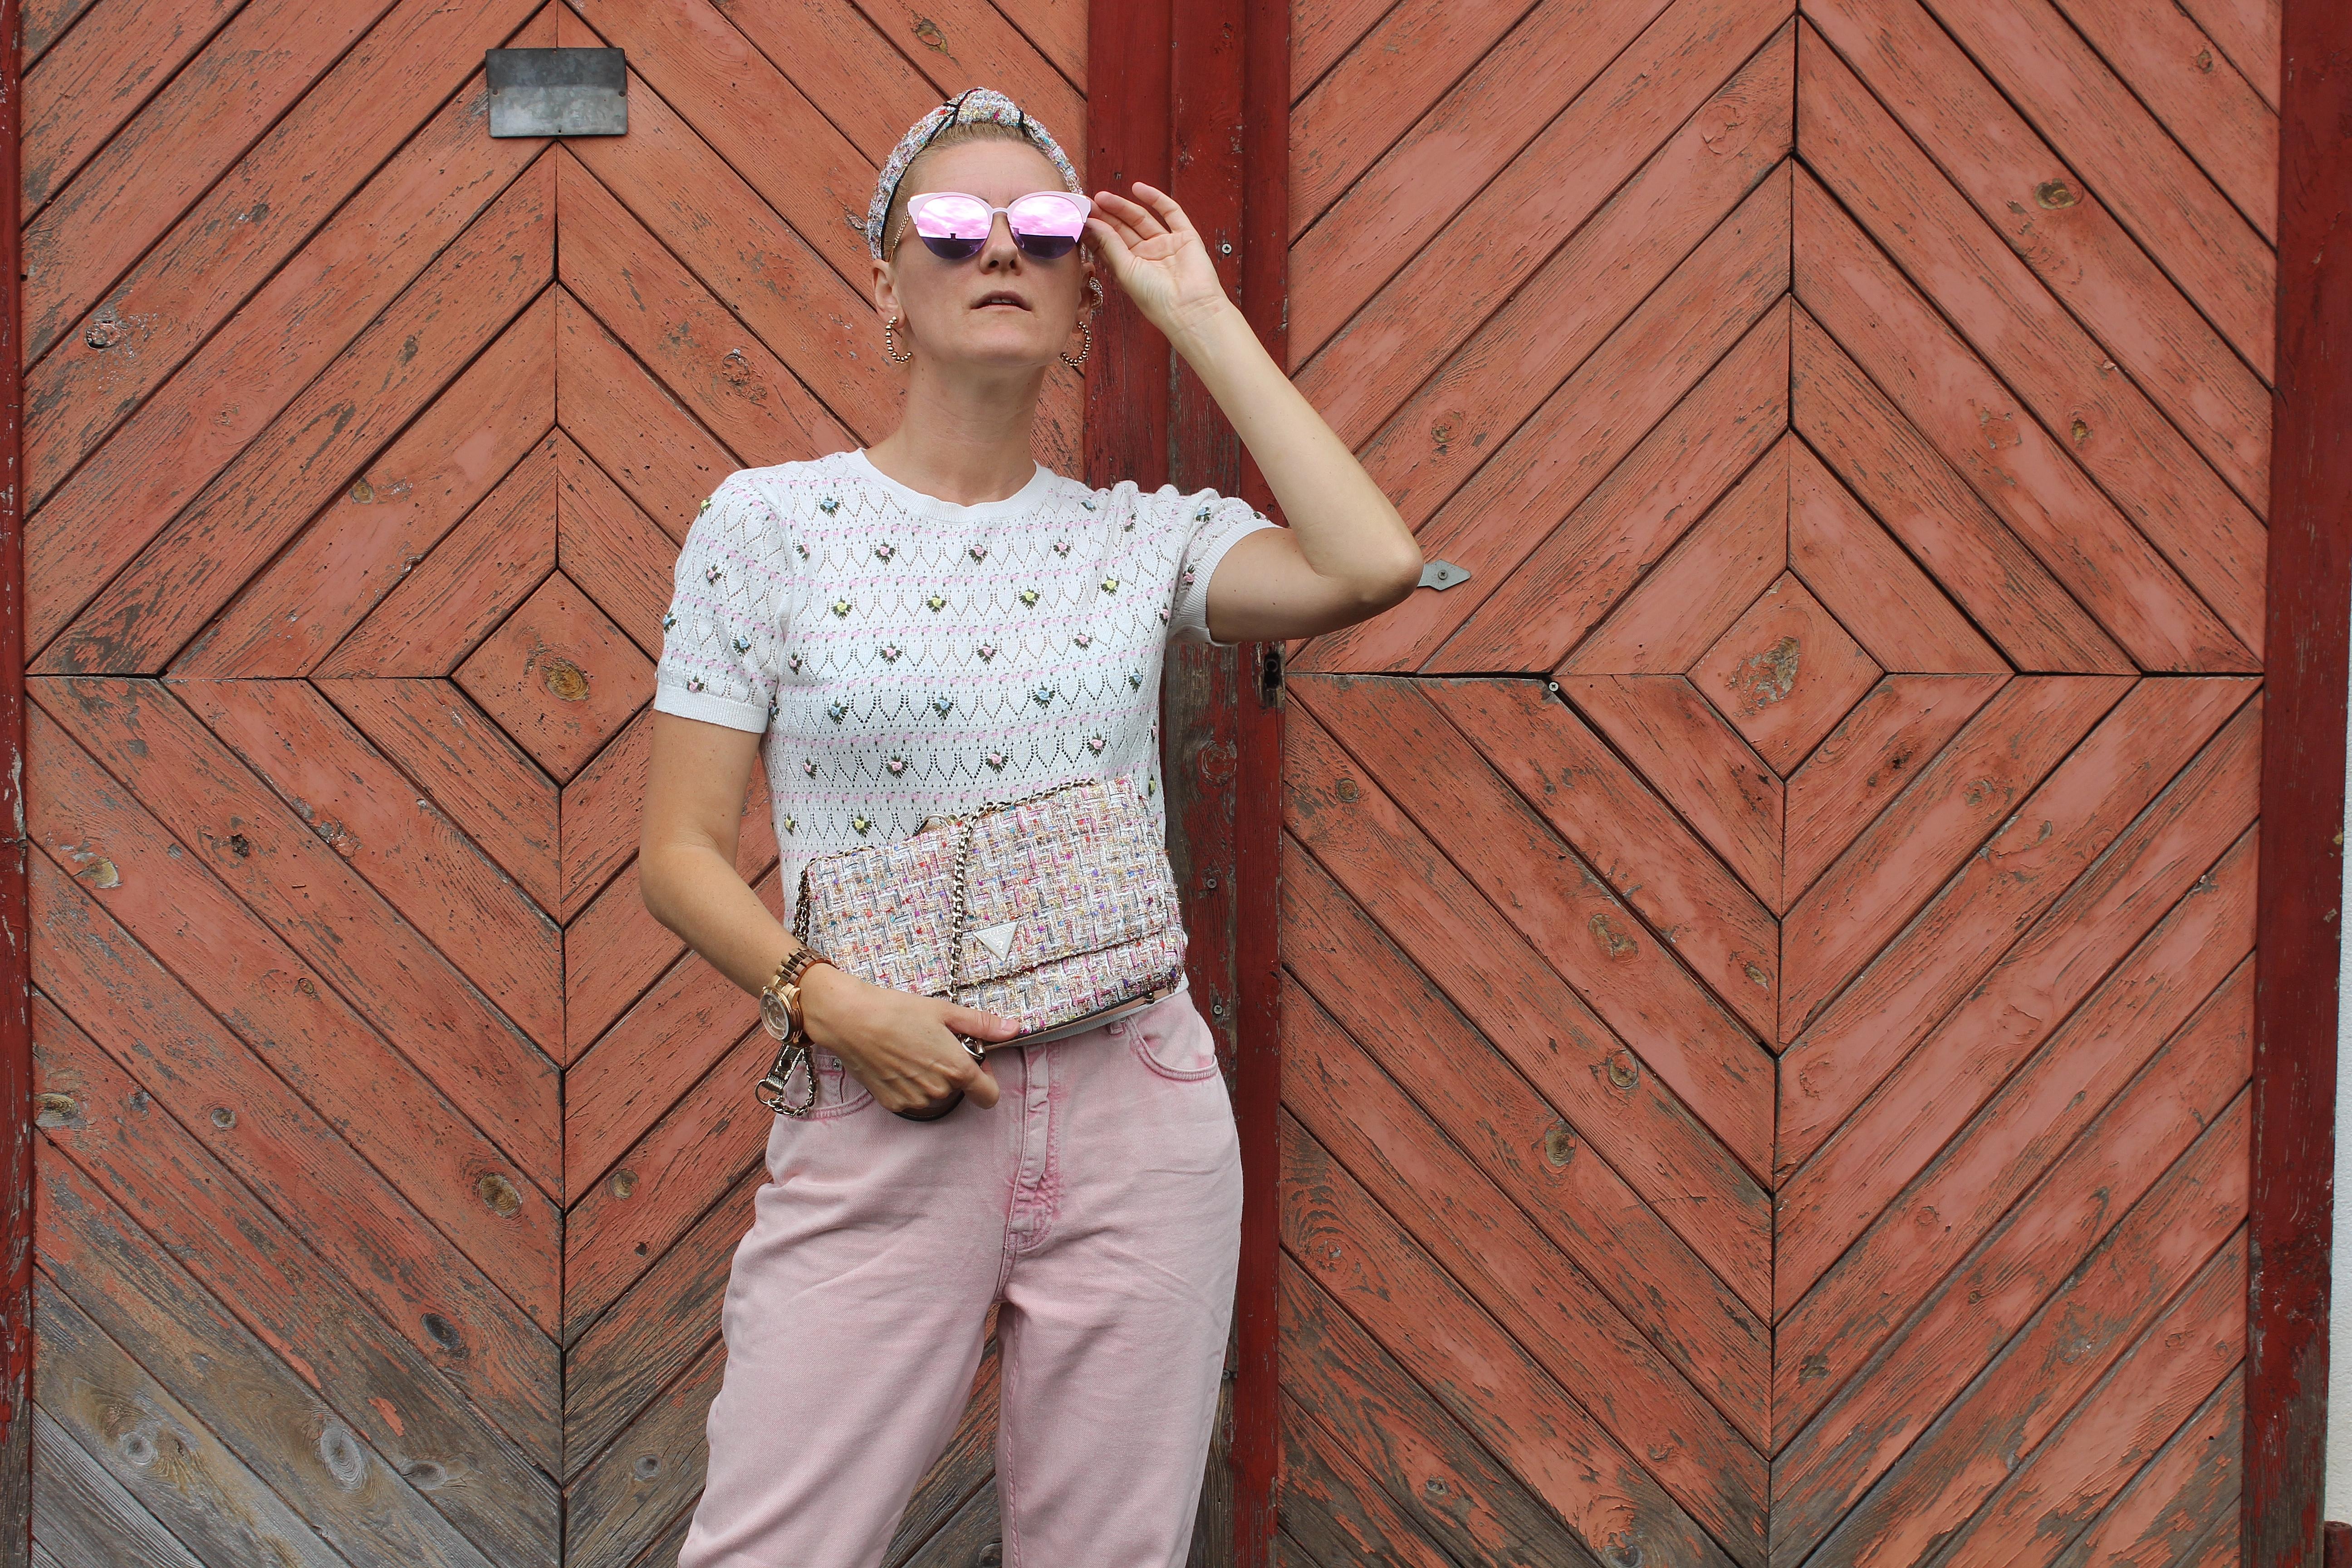 MoM Jeans-Nakd Fashion-Pinke Jeans-Guess Tasche Tweed-carrieslifestyle-Tamara Prutsch